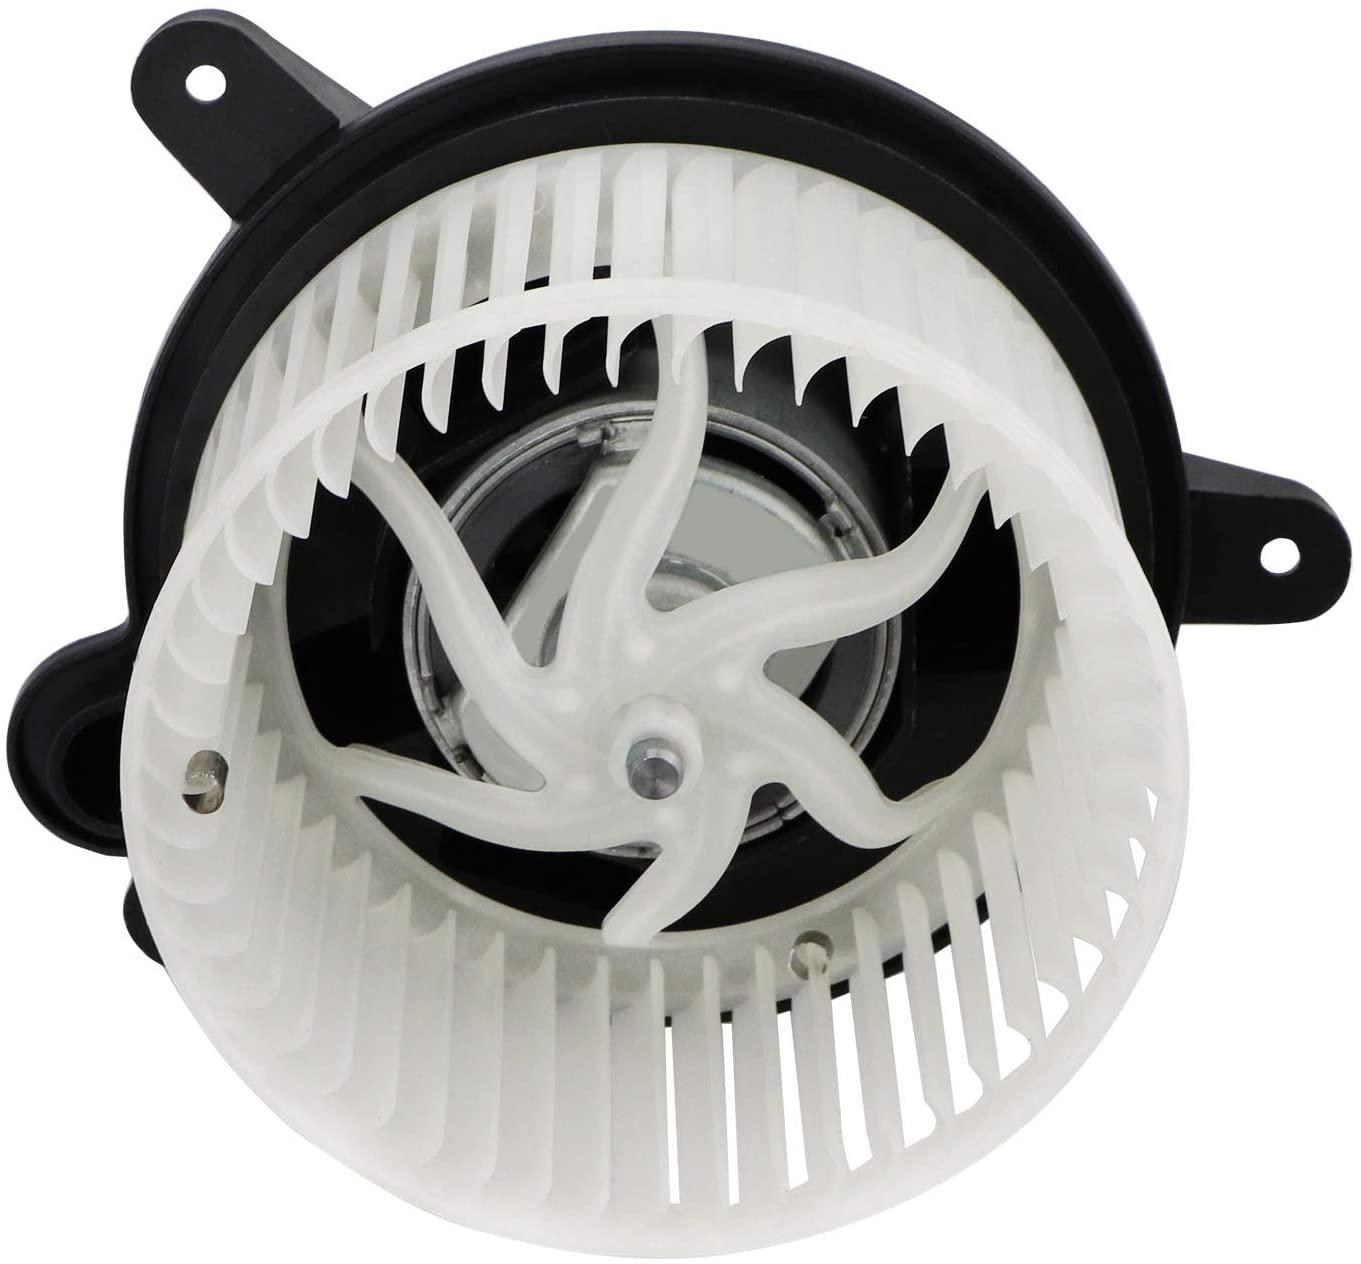 Dibanyou AC Heater Blower Motors with Fan HVAC Blower Motors Fits for Jeep Cherokee/Jeep Wrangler 1997-2001 OE # 700095 4886150AA